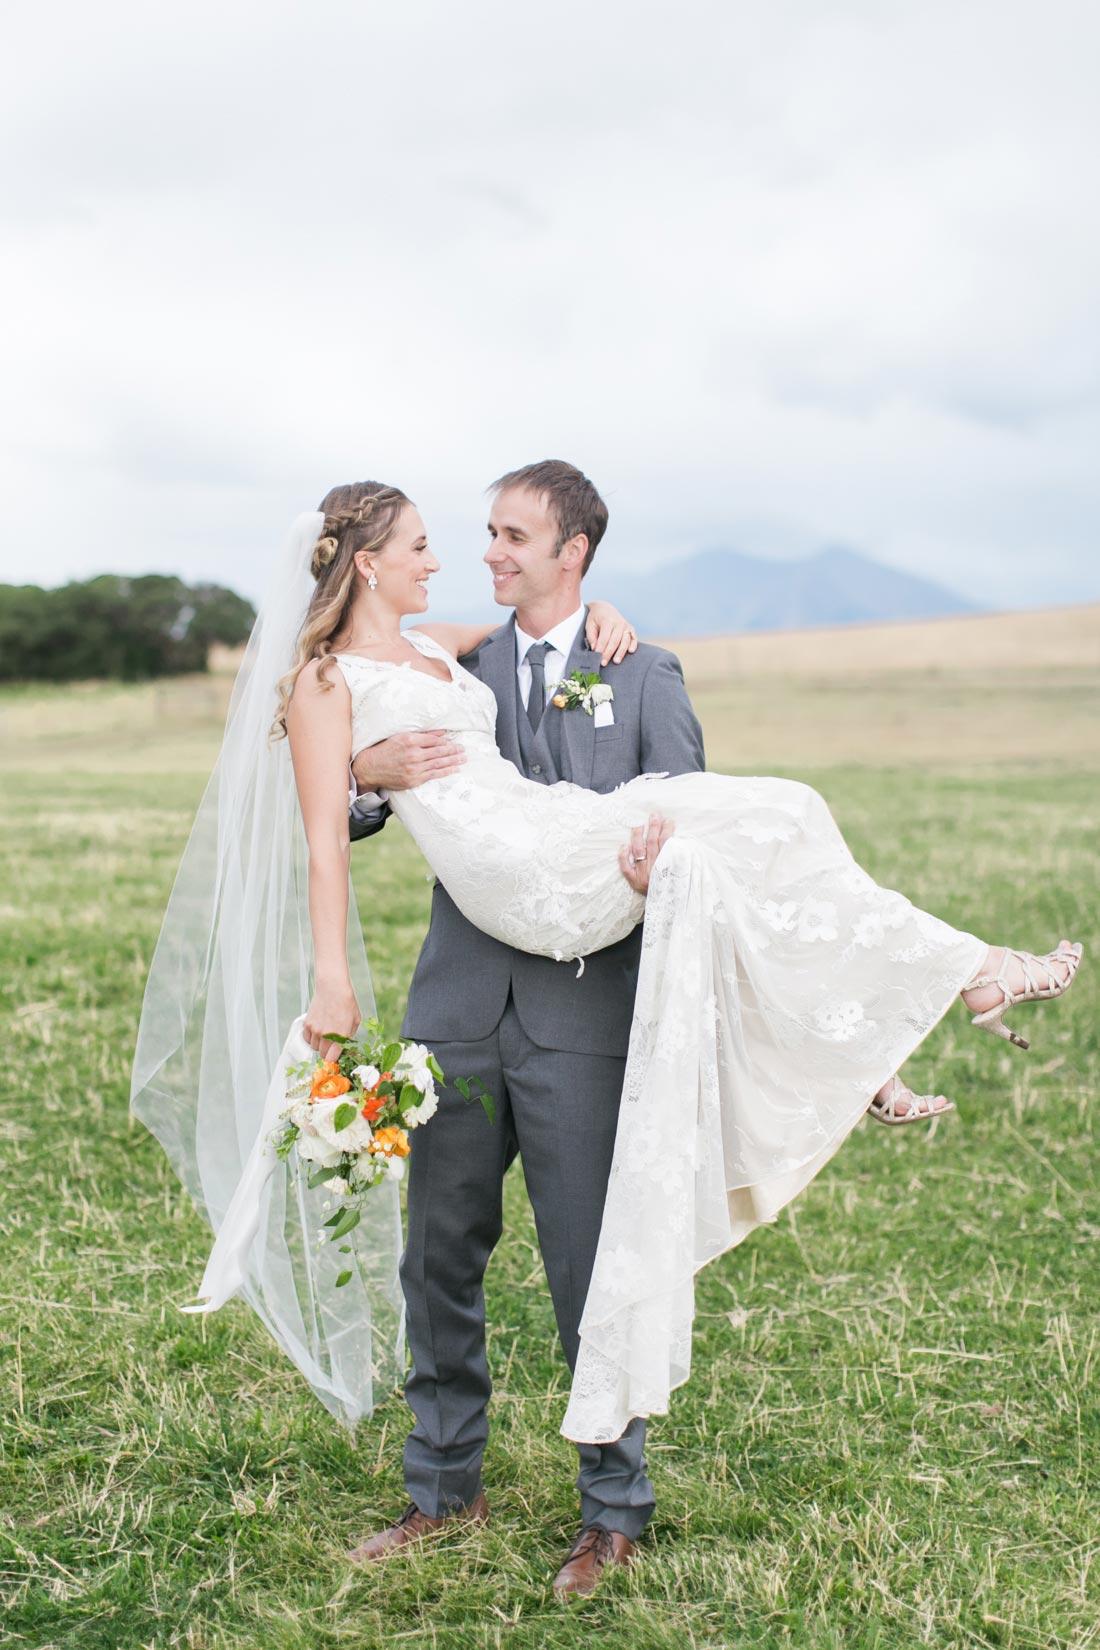 Megan_Zack_Cedar_Ridge_Ranch_Wedding_by_Connie_Whitlock_web_384.jpg